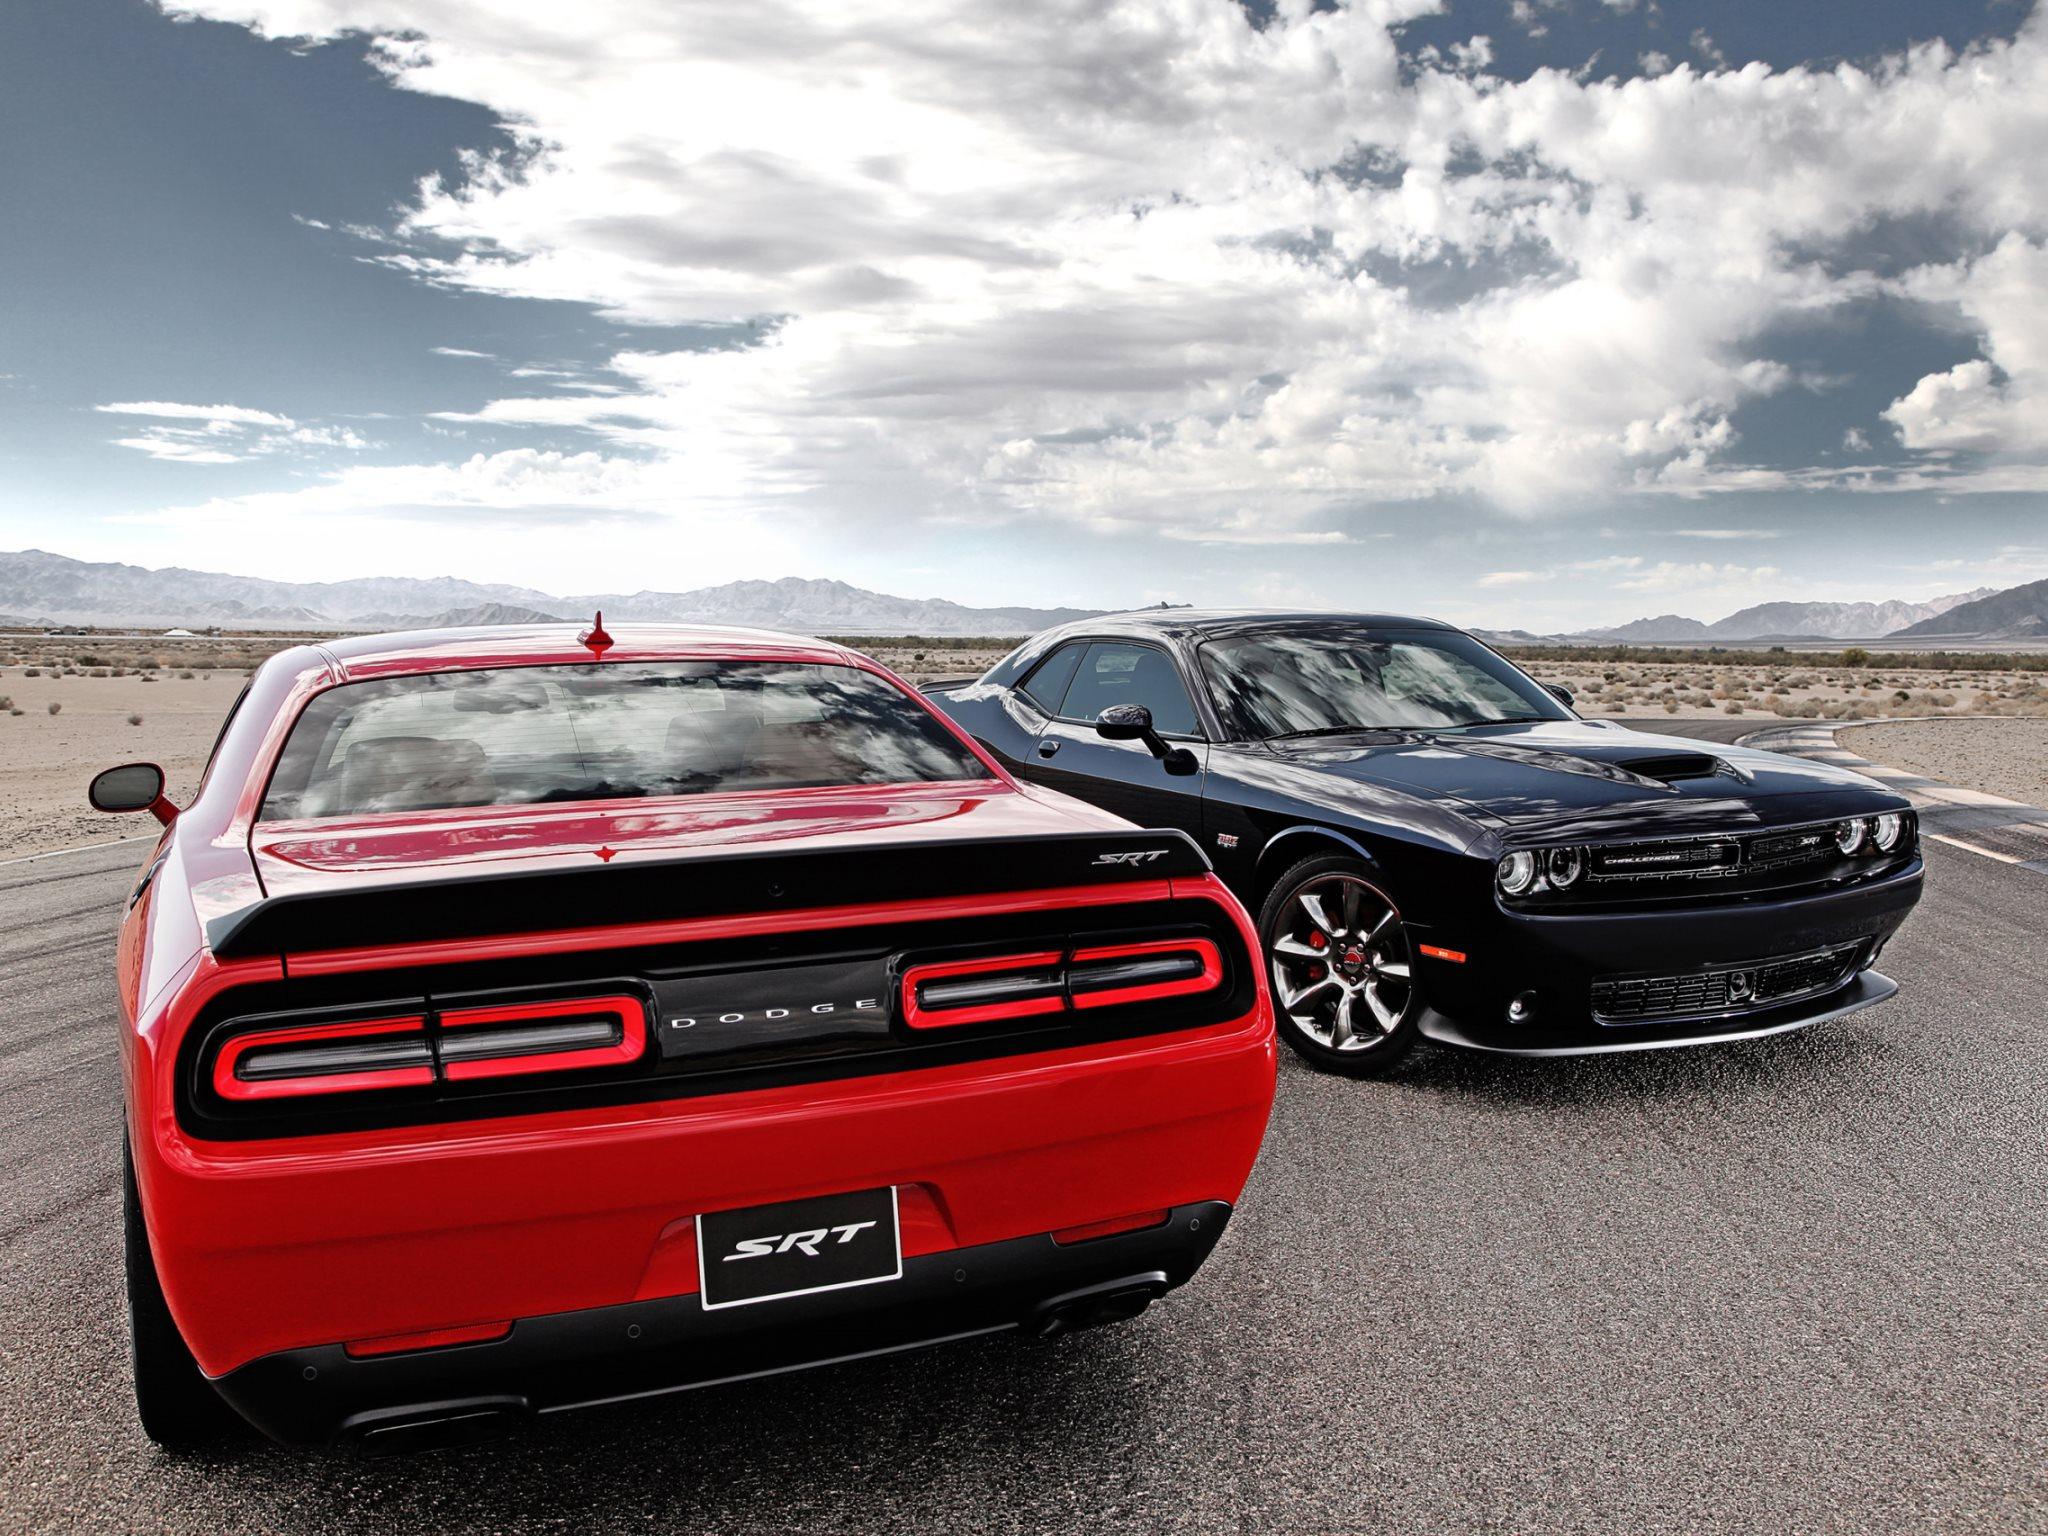 Dodge Challenger SRT Hellcat 2015 HD Wallpapers · 4K